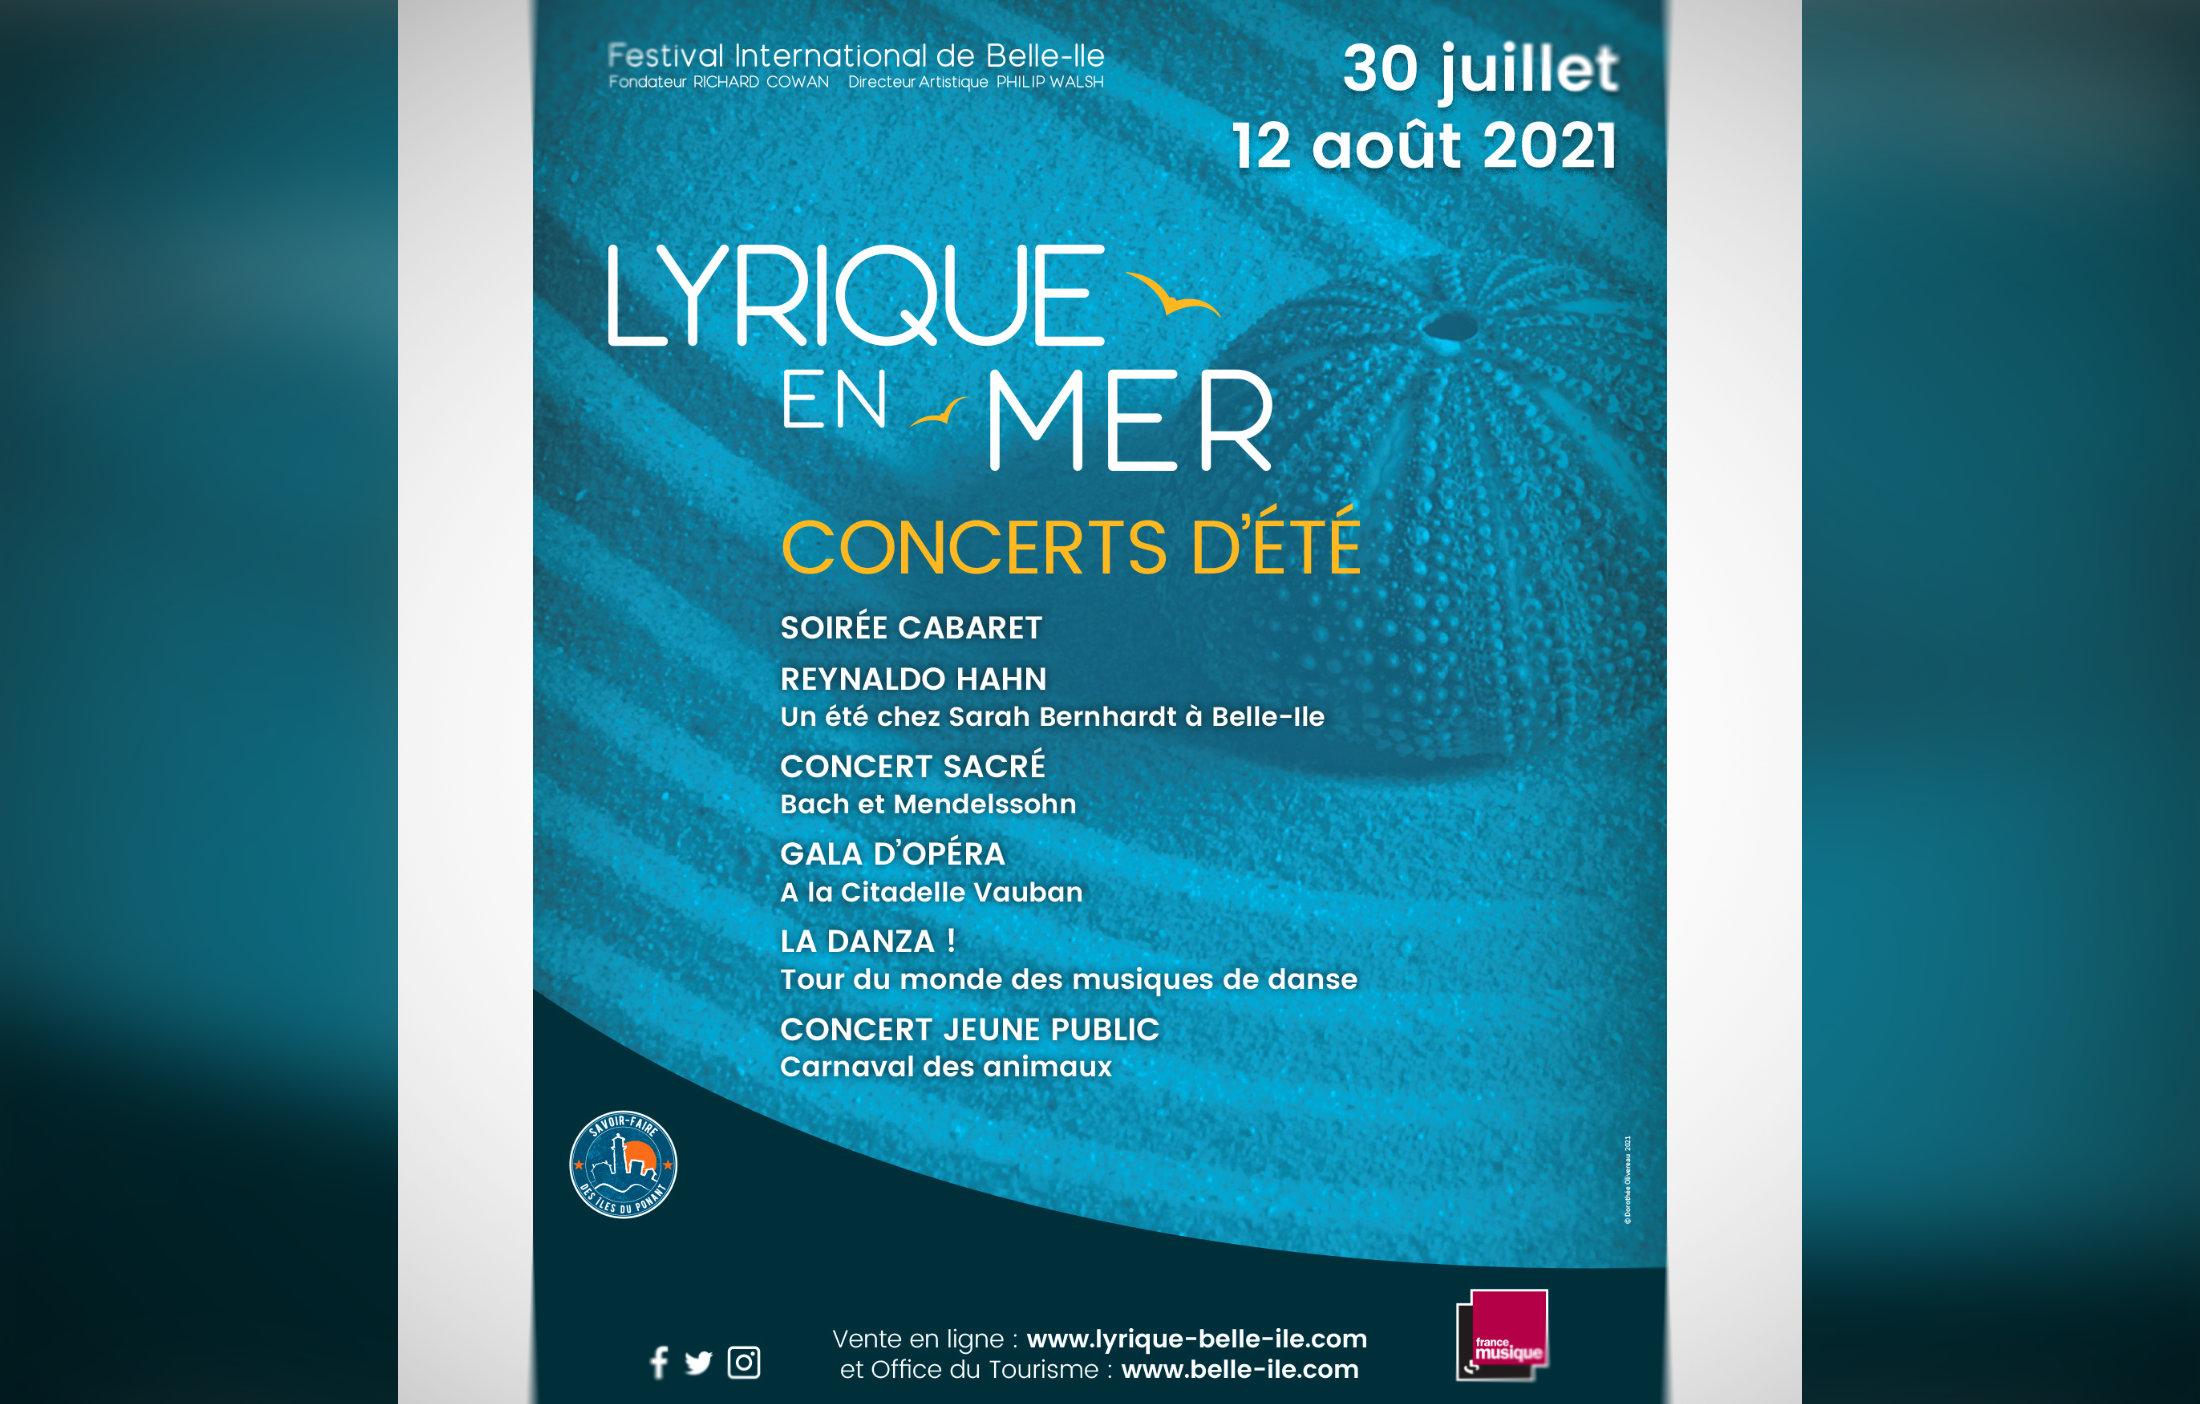 Festival-Lyrique-en-mer-2021@2x